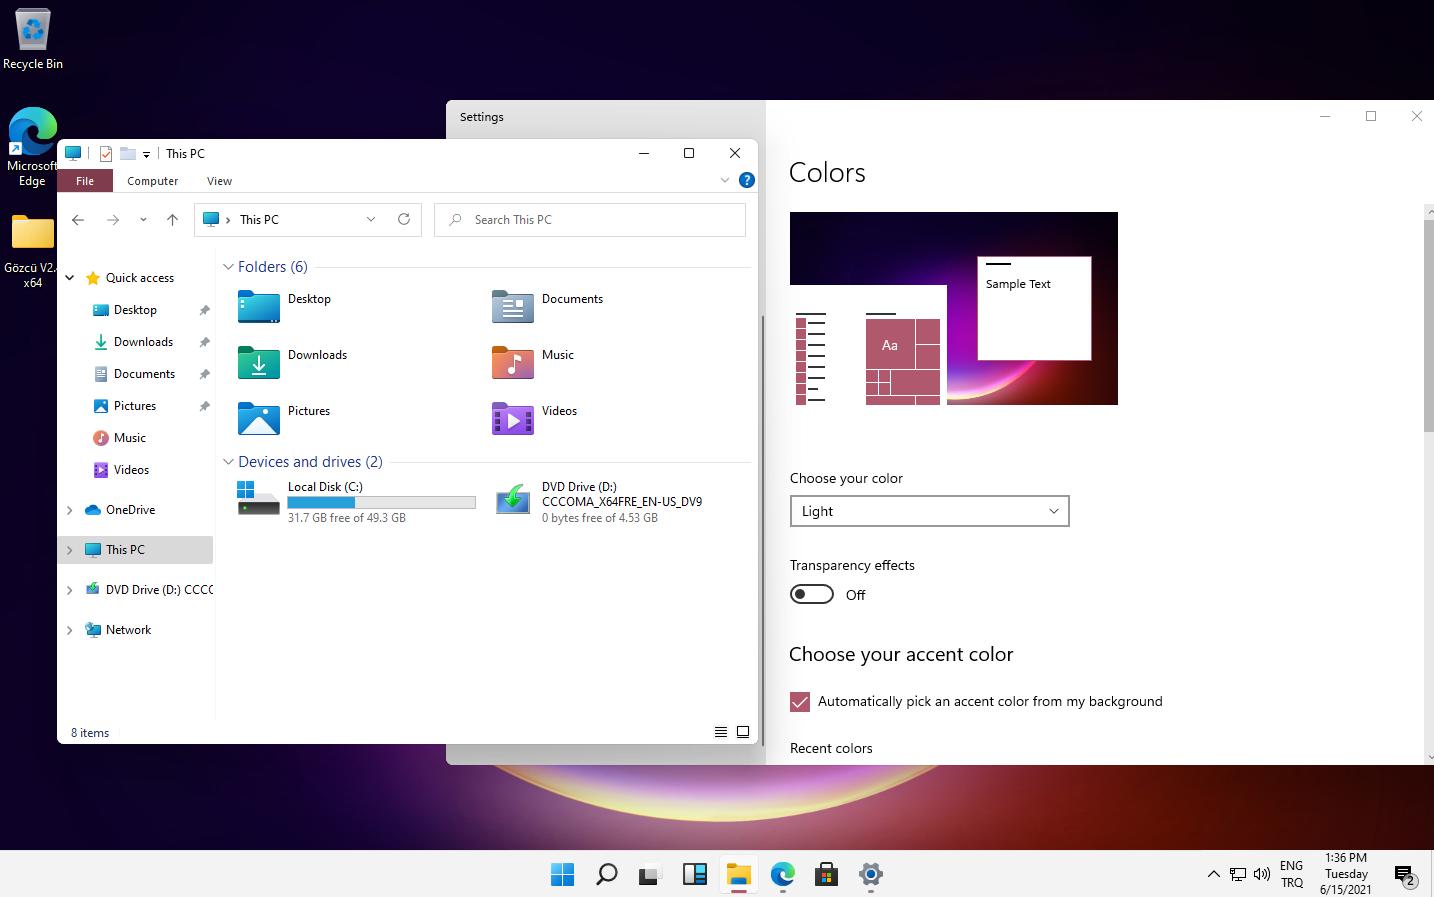 Windows 11 - Light.png